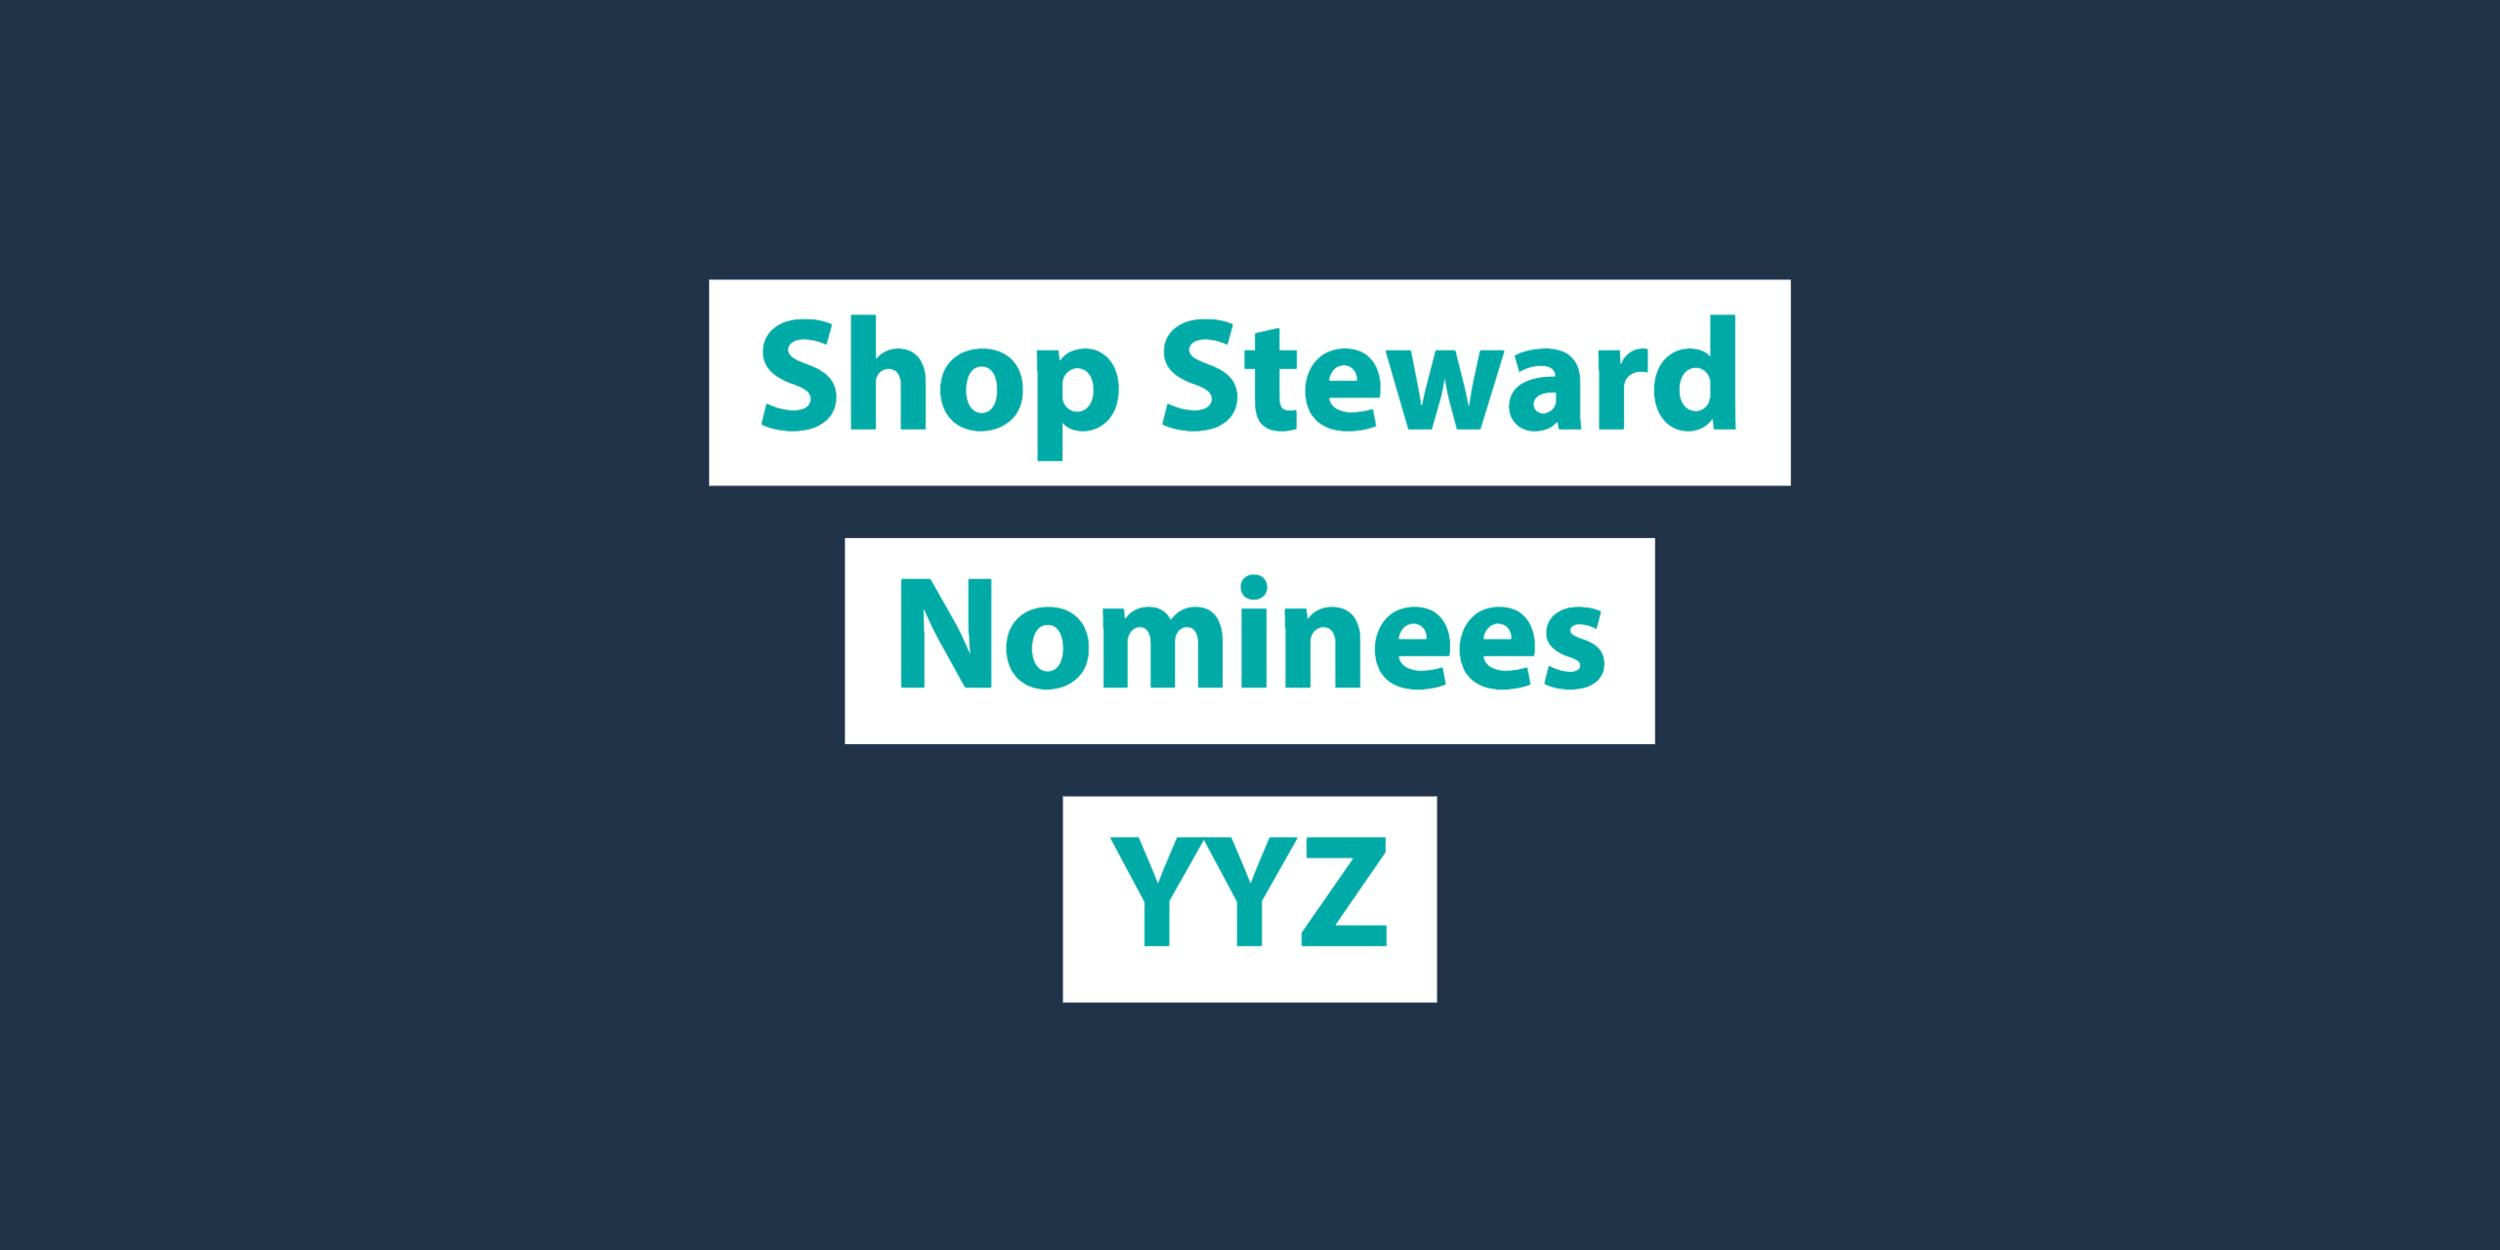 YYZShopStewardNomination(V6)) (1).png